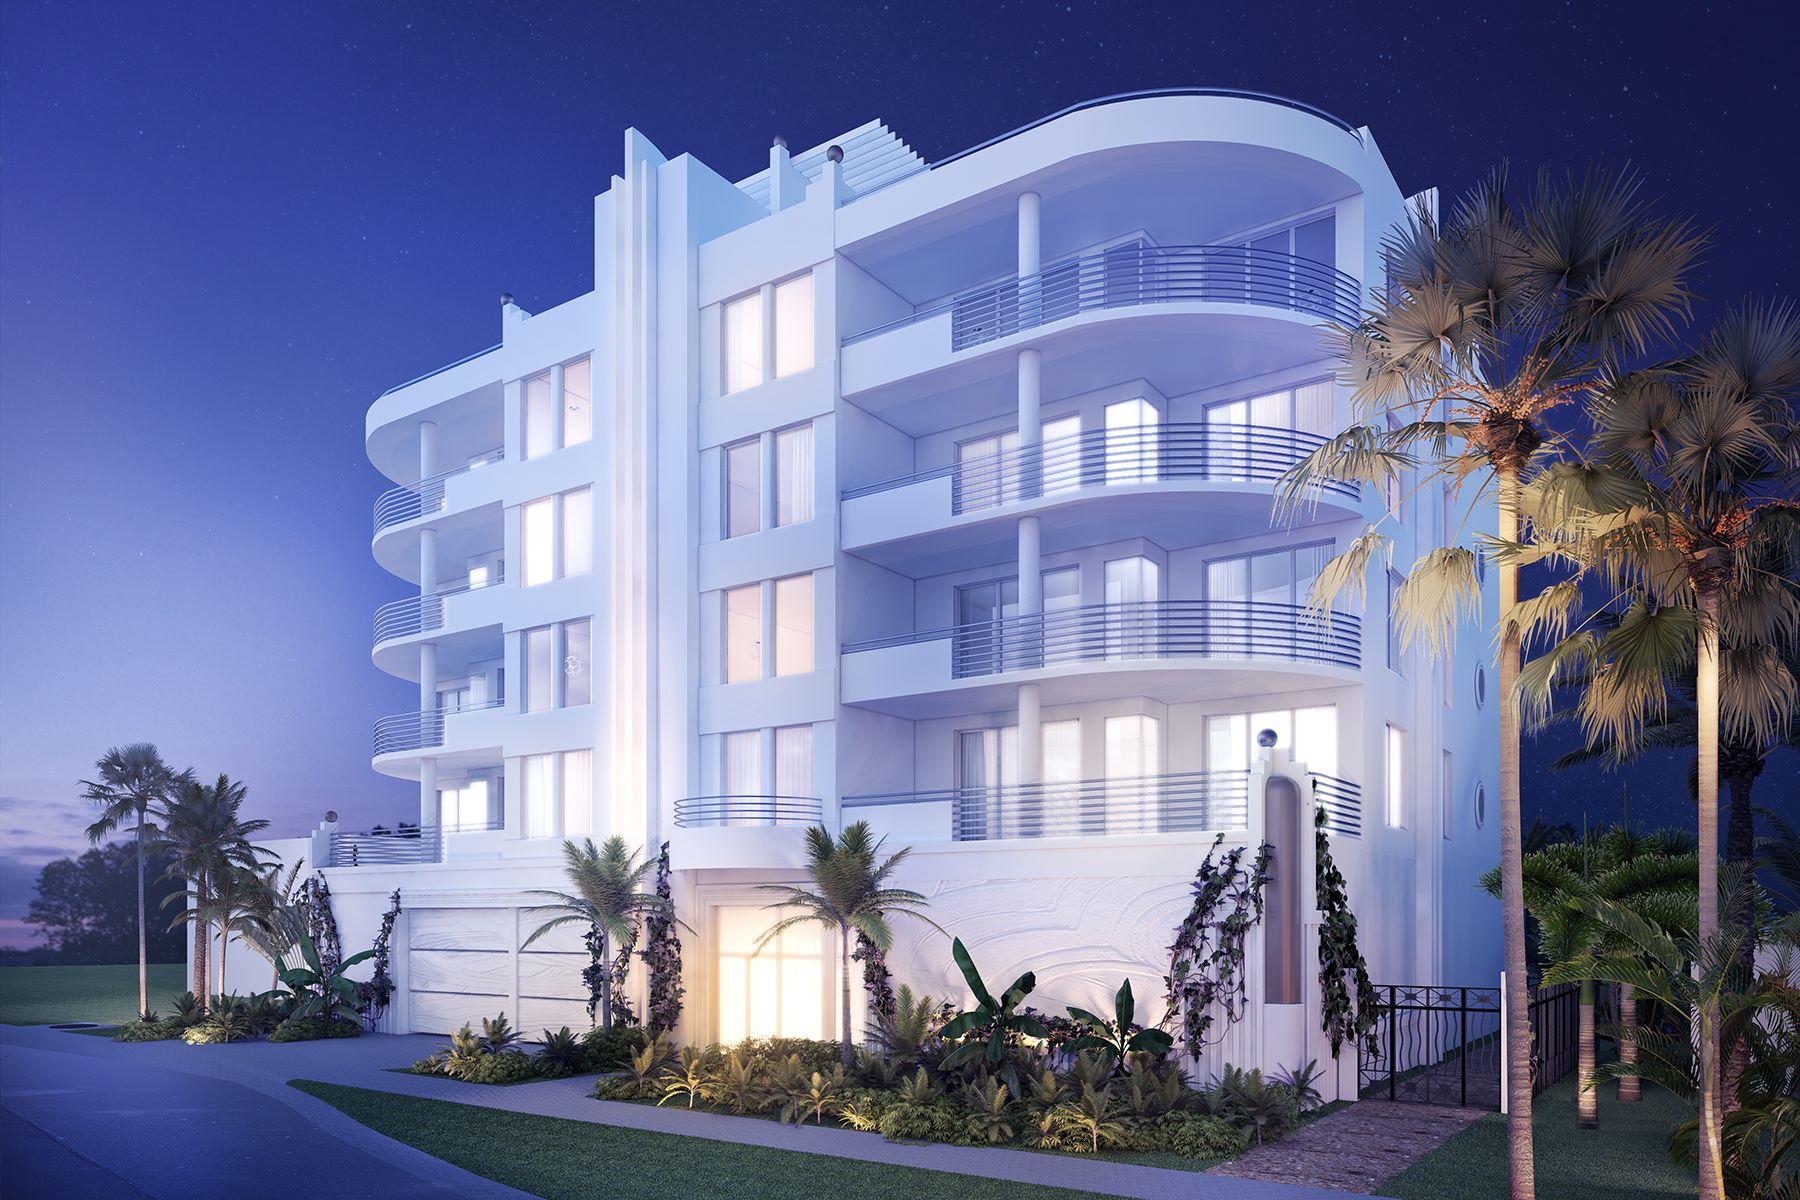 Condominium for Sale at GOLDEN GATE POINT 609 Golden Gate Pt 402 4, Sarasota, Florida 34236 United States